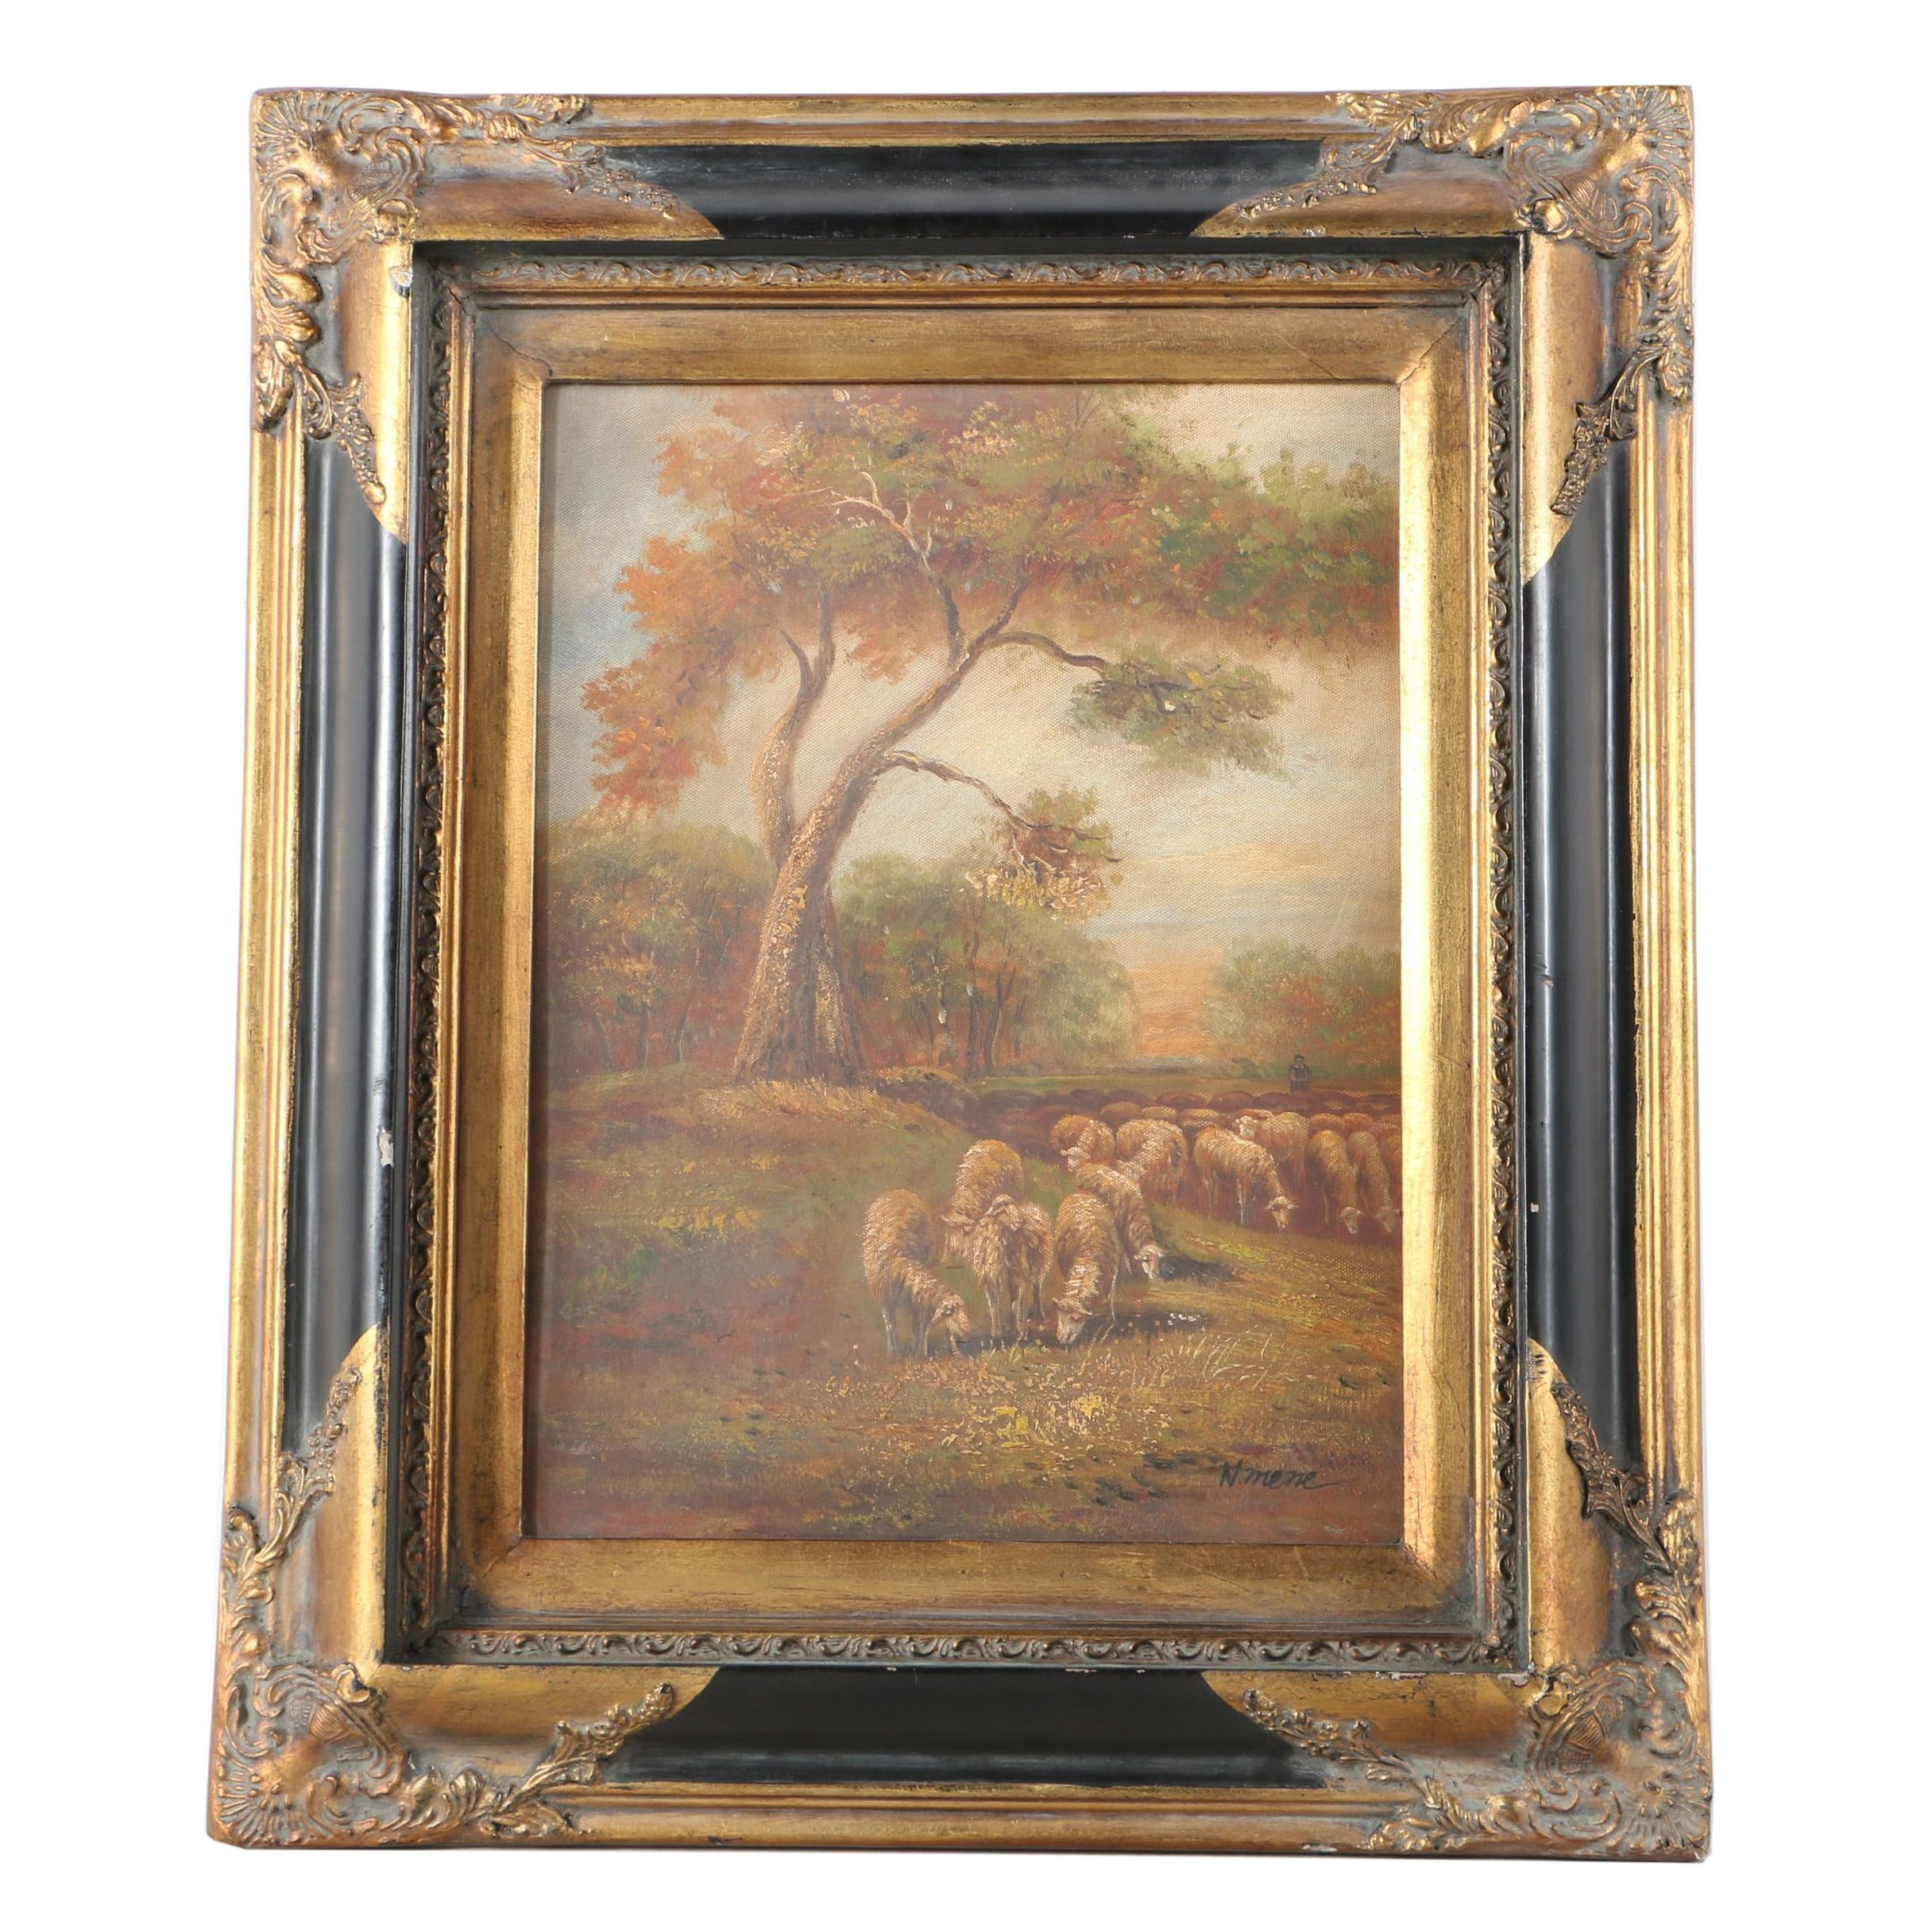 N. Mene Oil on Canvas Landscape Painting